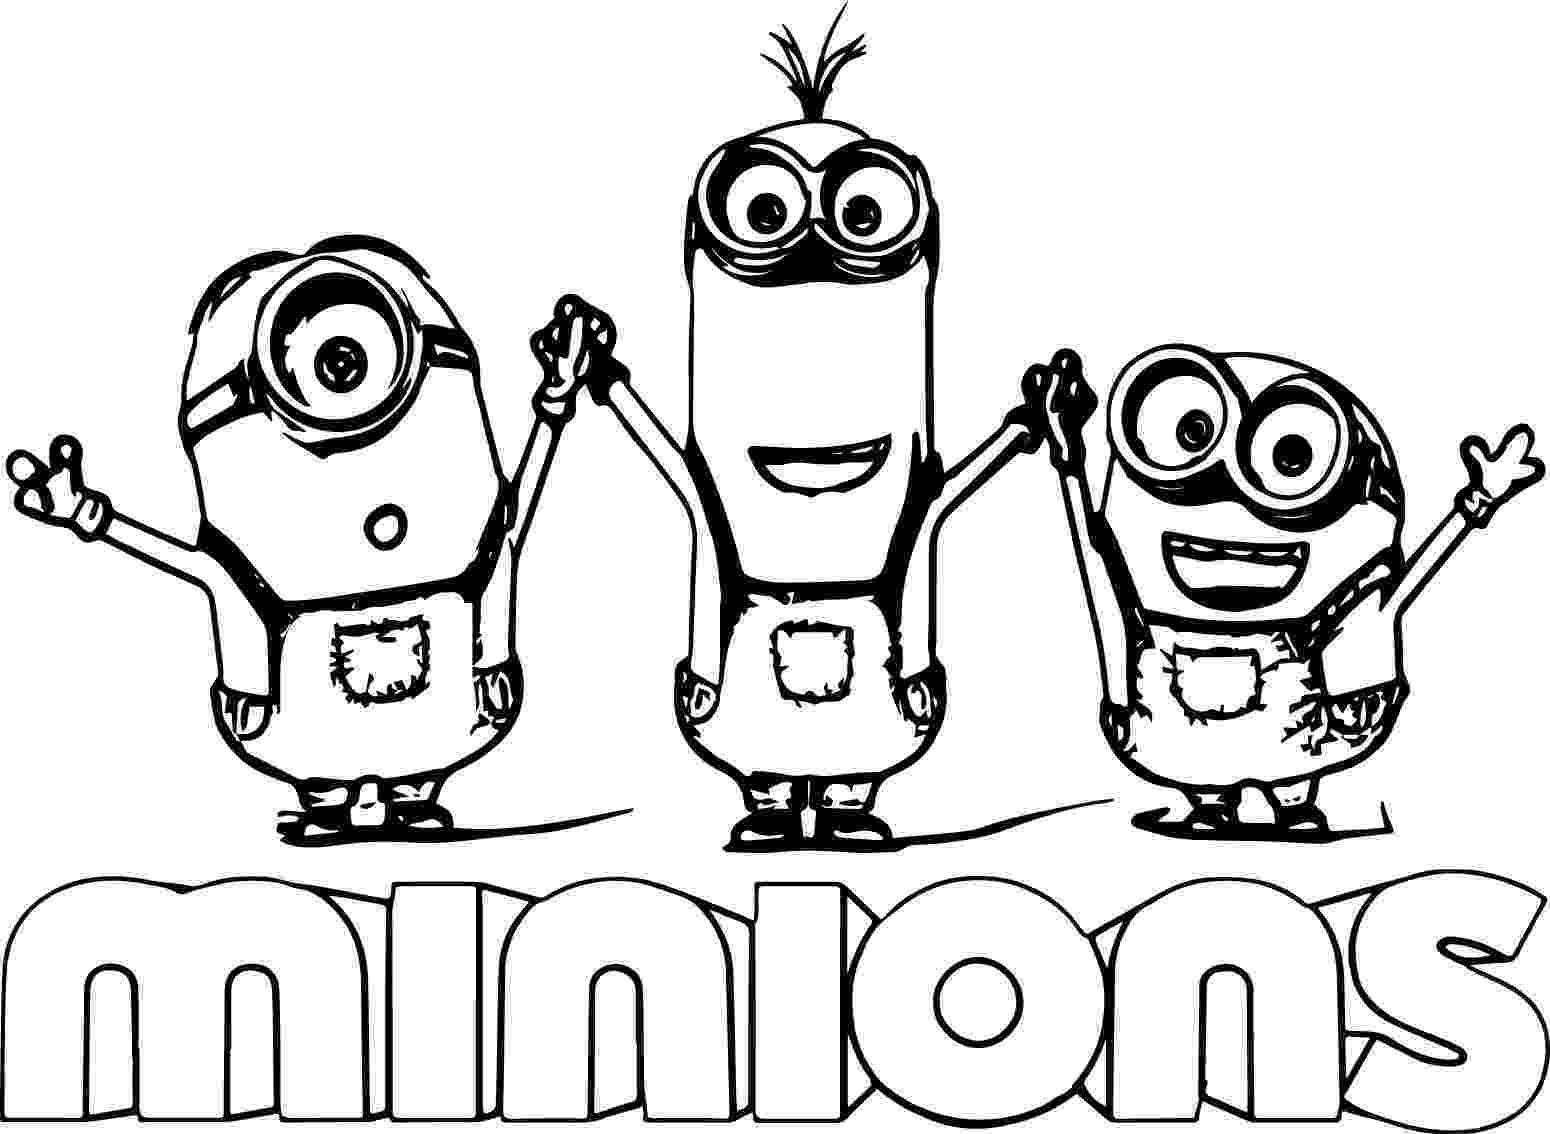 minions black and white minion text minions backyard bash coloring page minions white black and